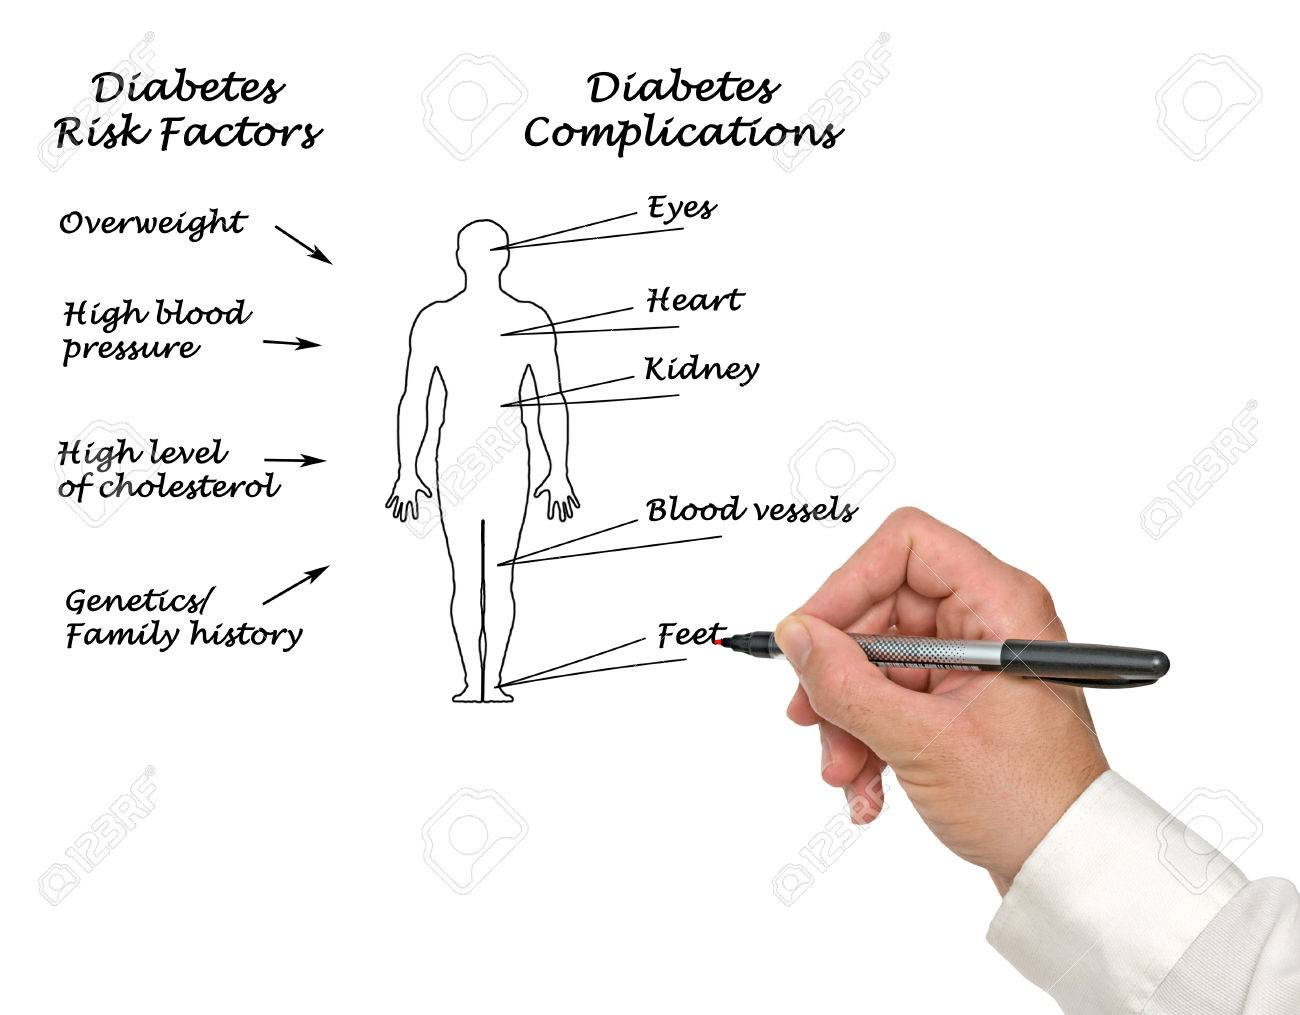 Diabetes complications Stock Photo - 45130279